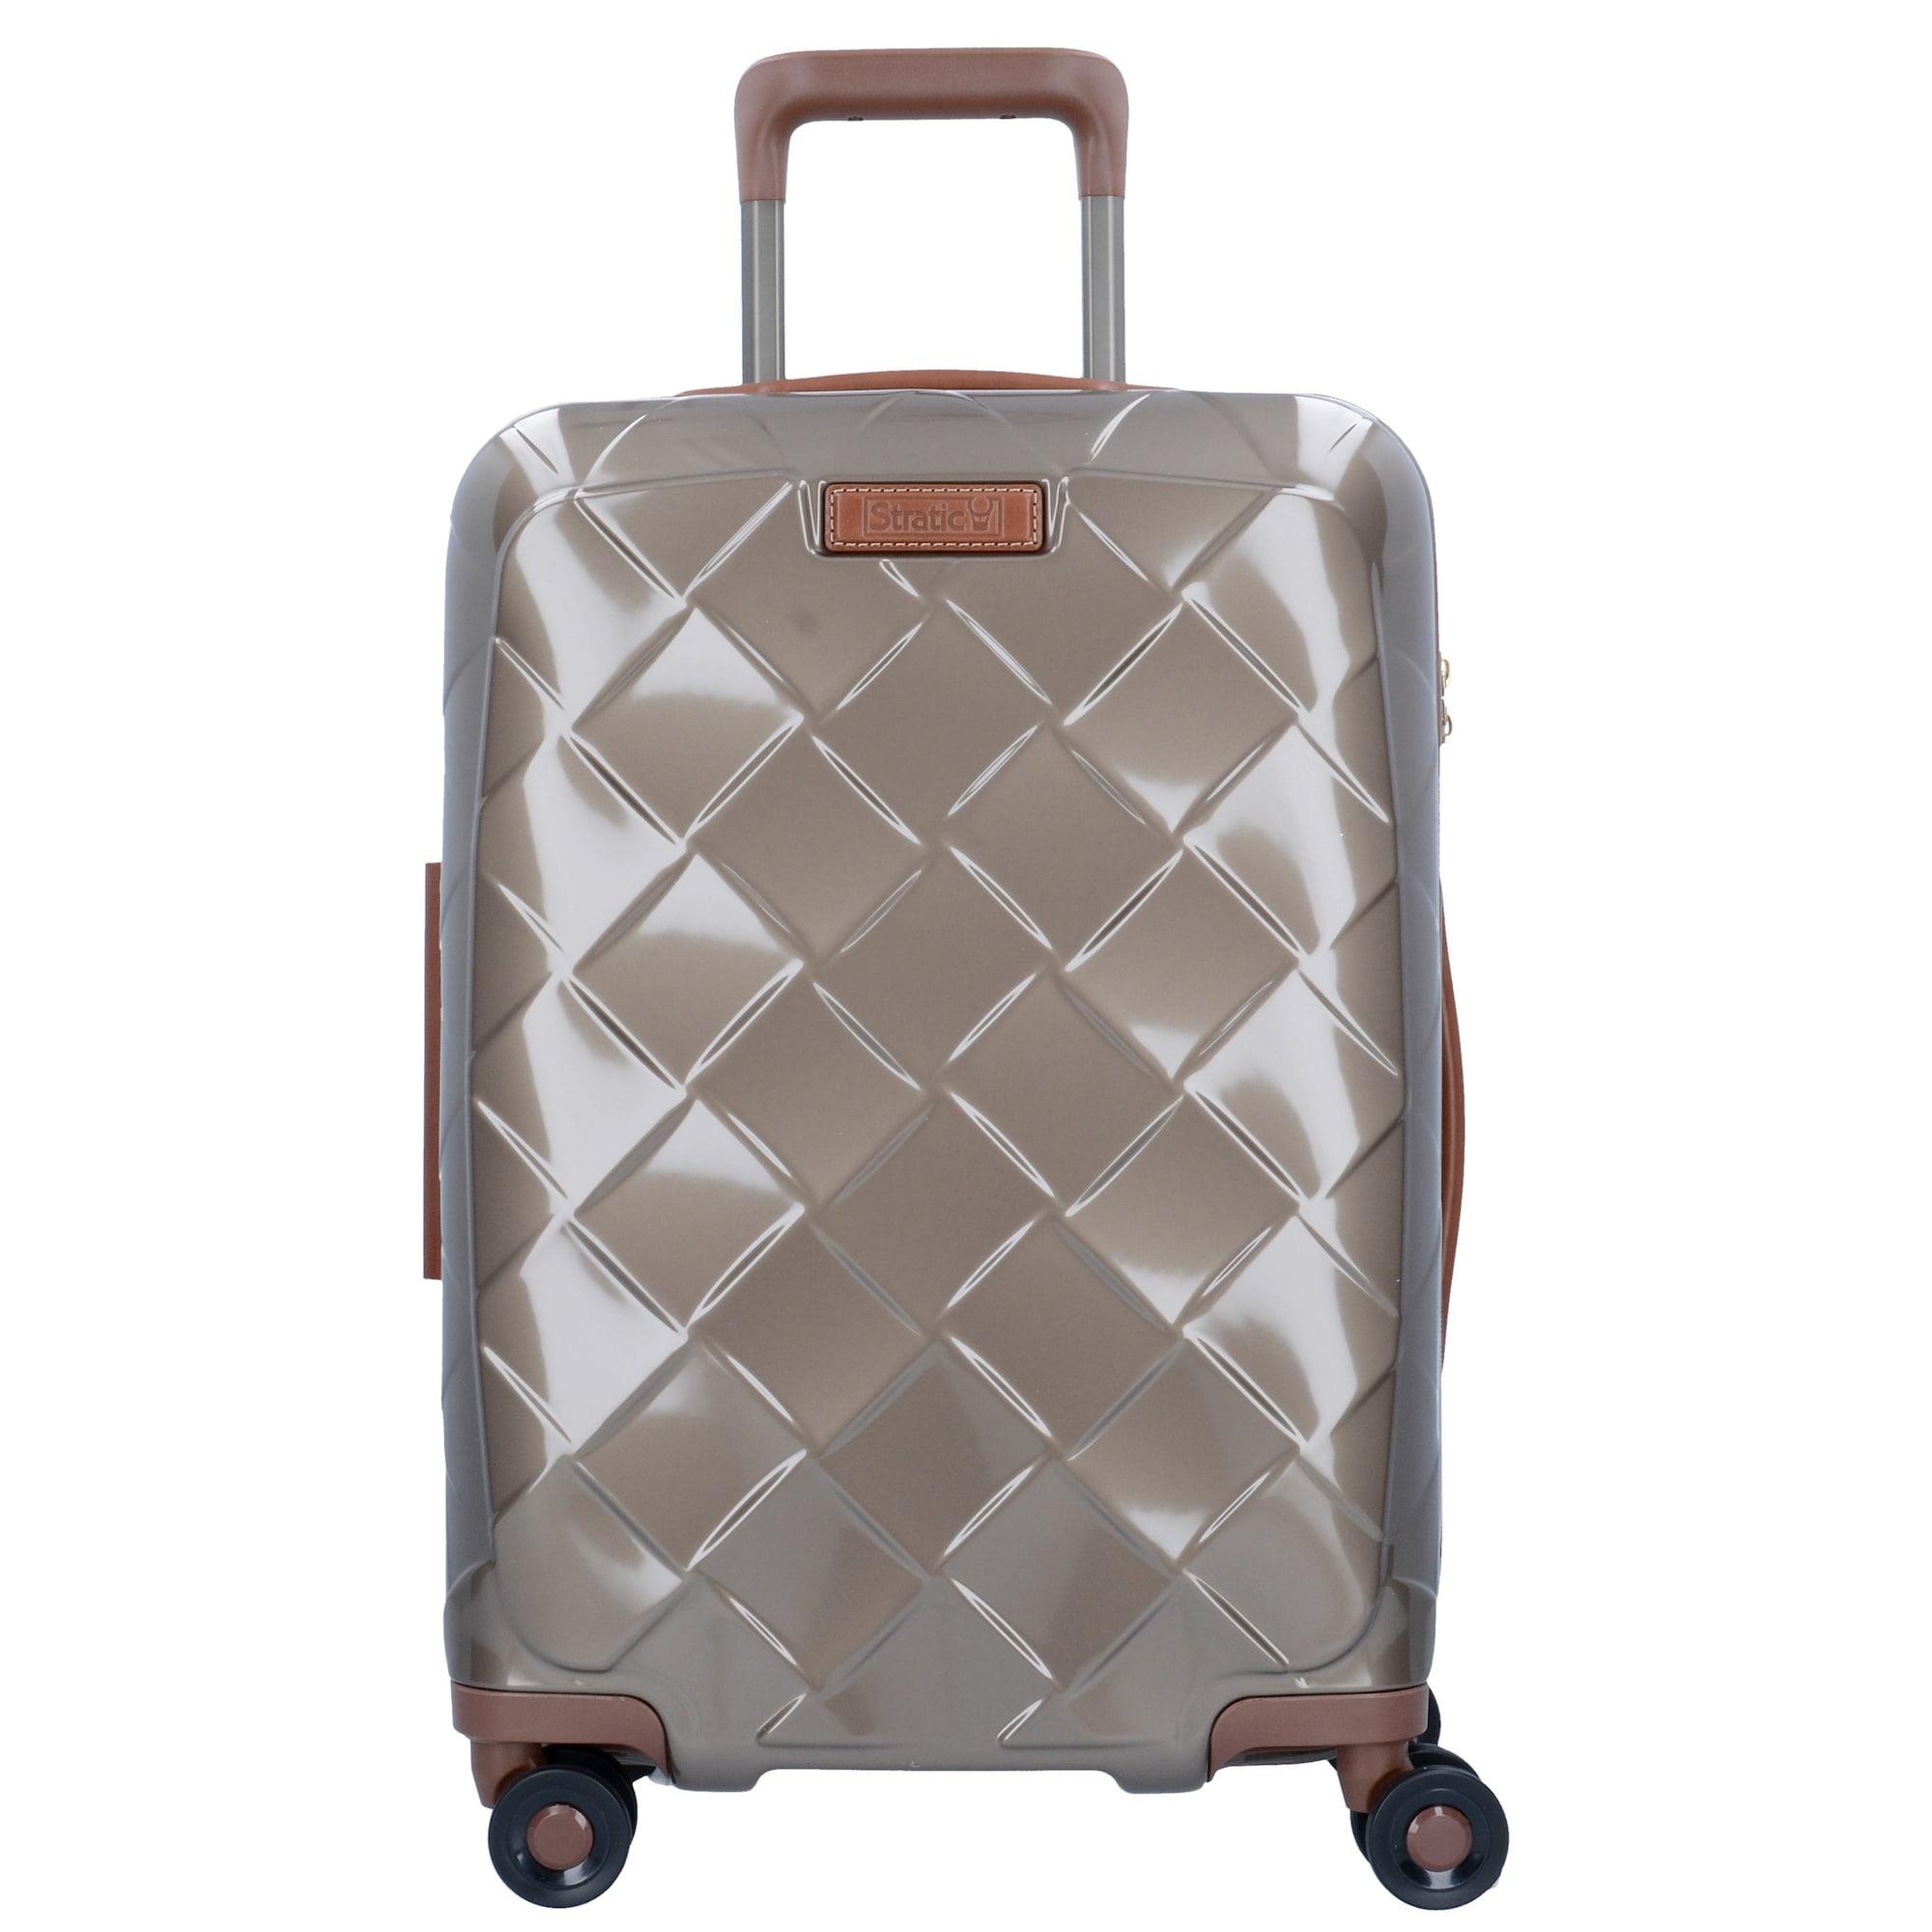 Trolley | Taschen > Koffer & Trolleys | Stratic